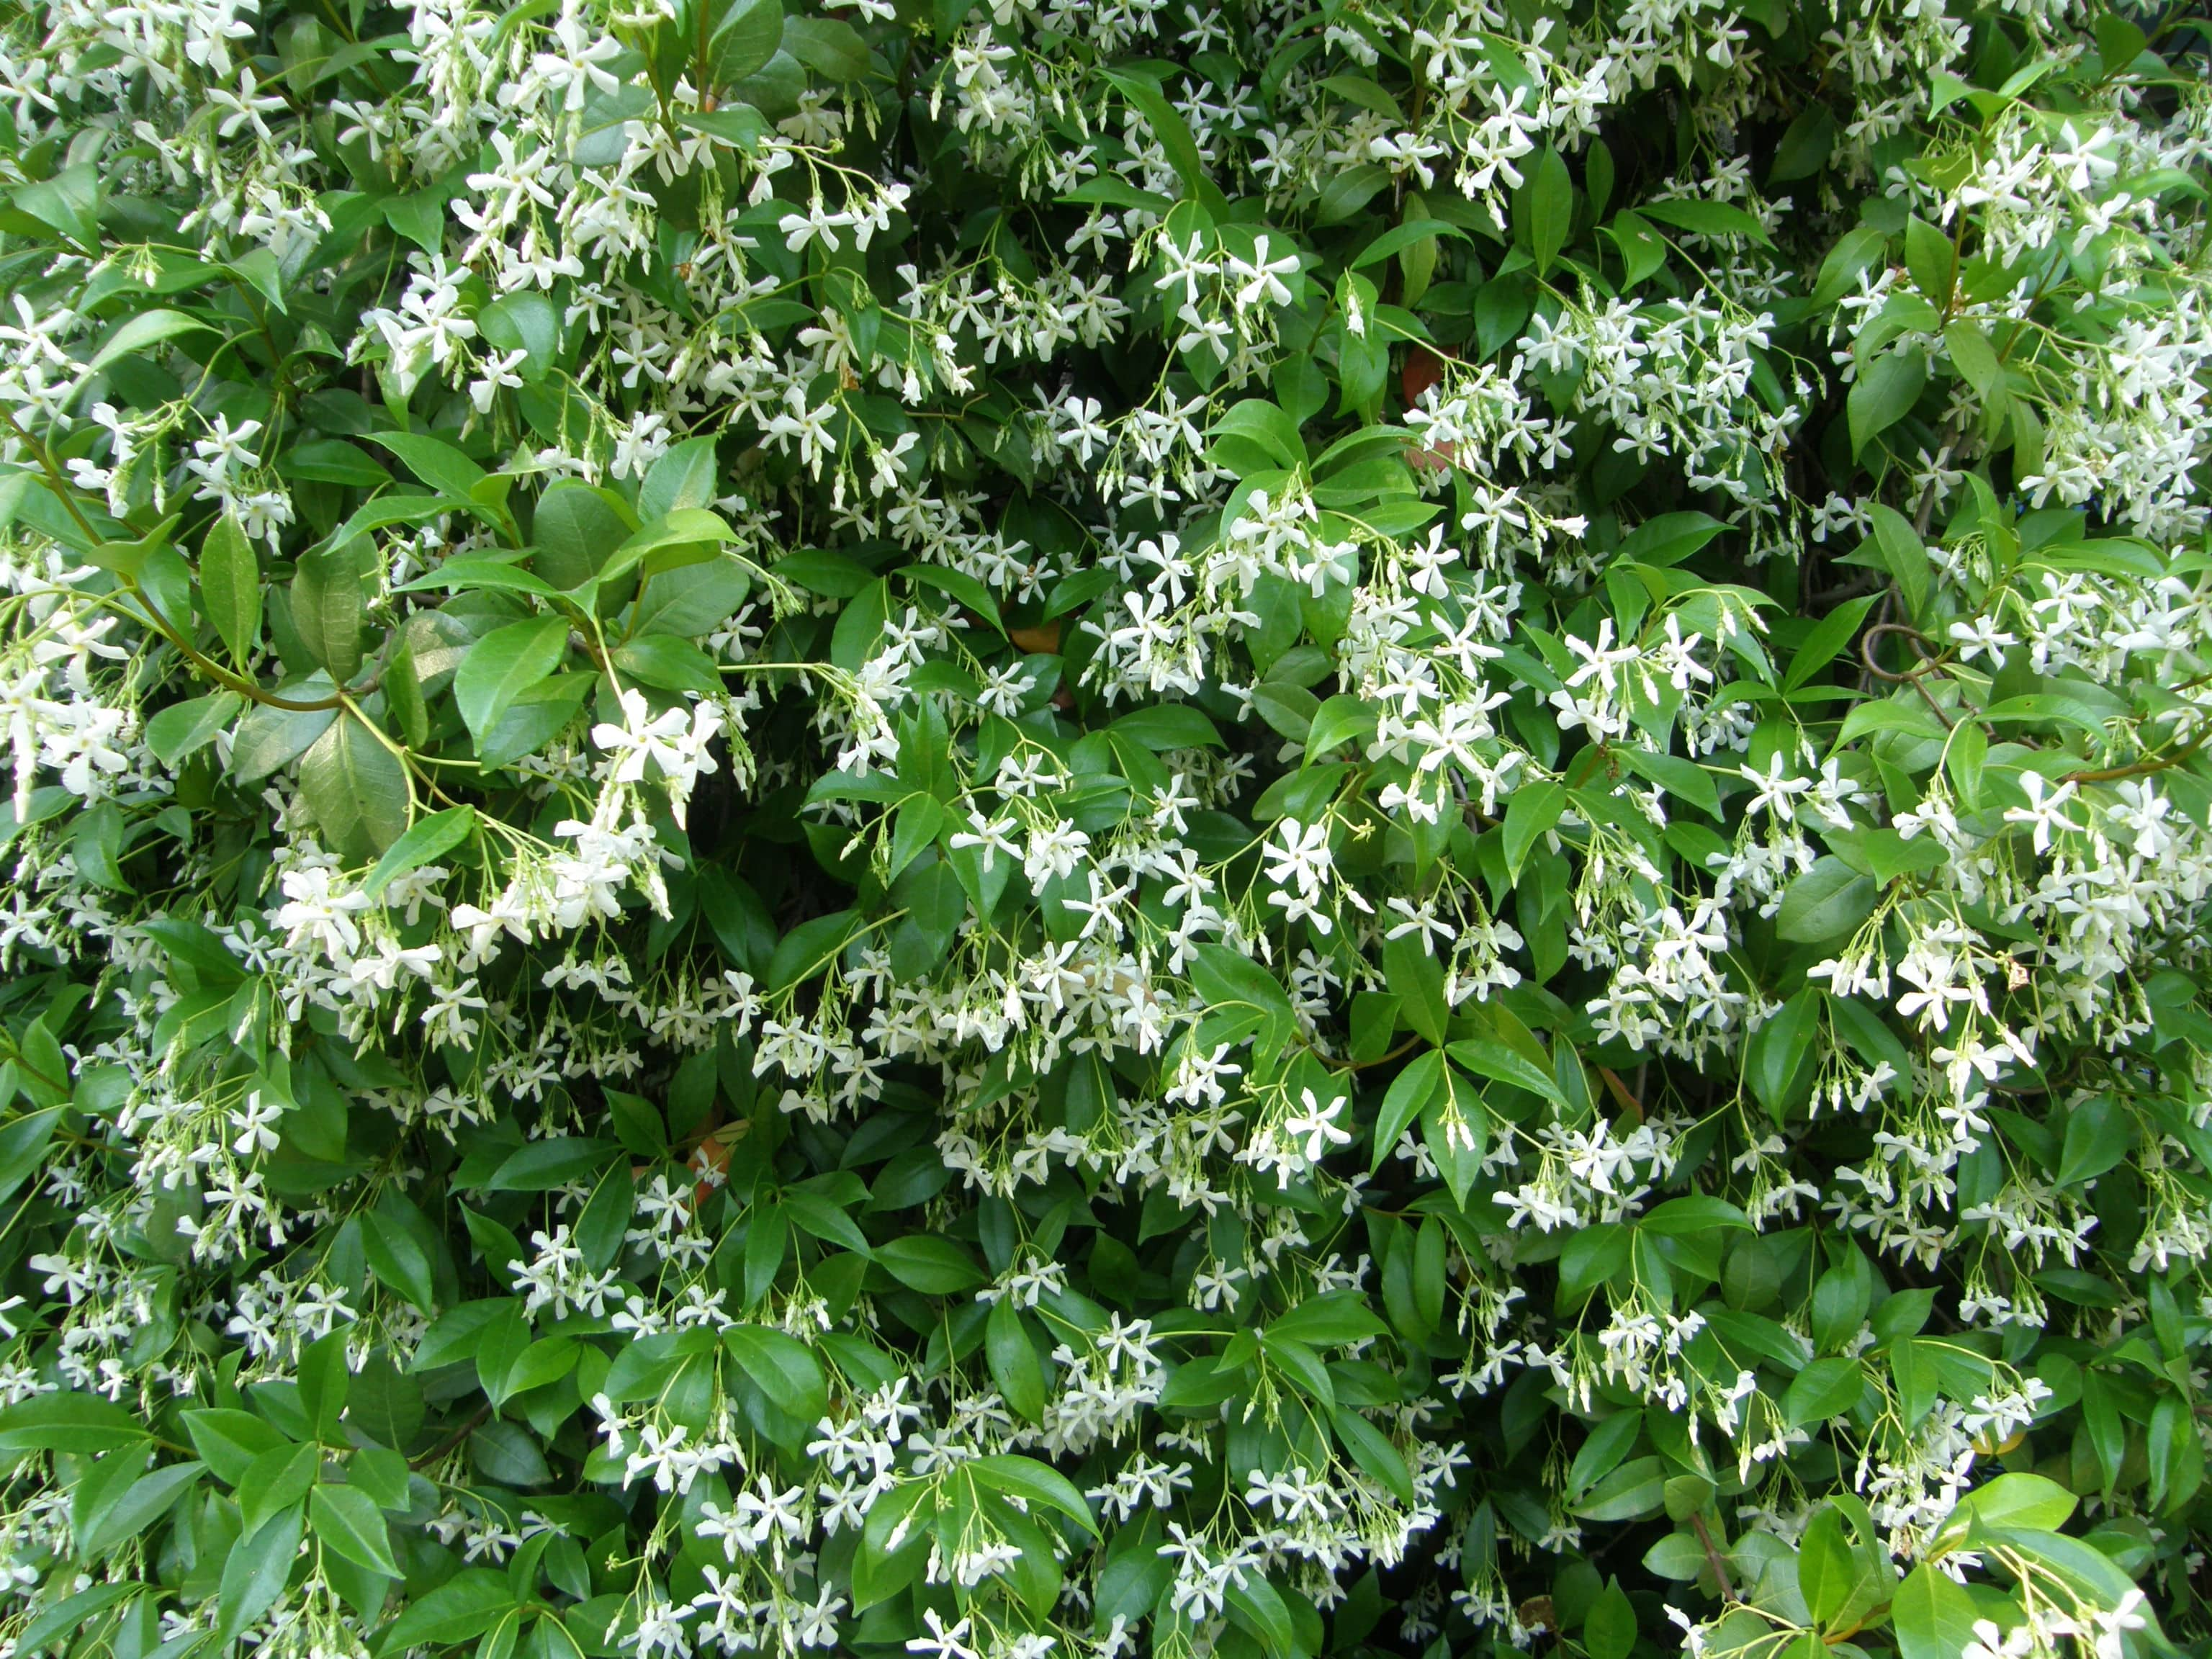 Jasmin blanc jasmin d 39 t humeur de jardinier - Jasmin d hiver blanc ...